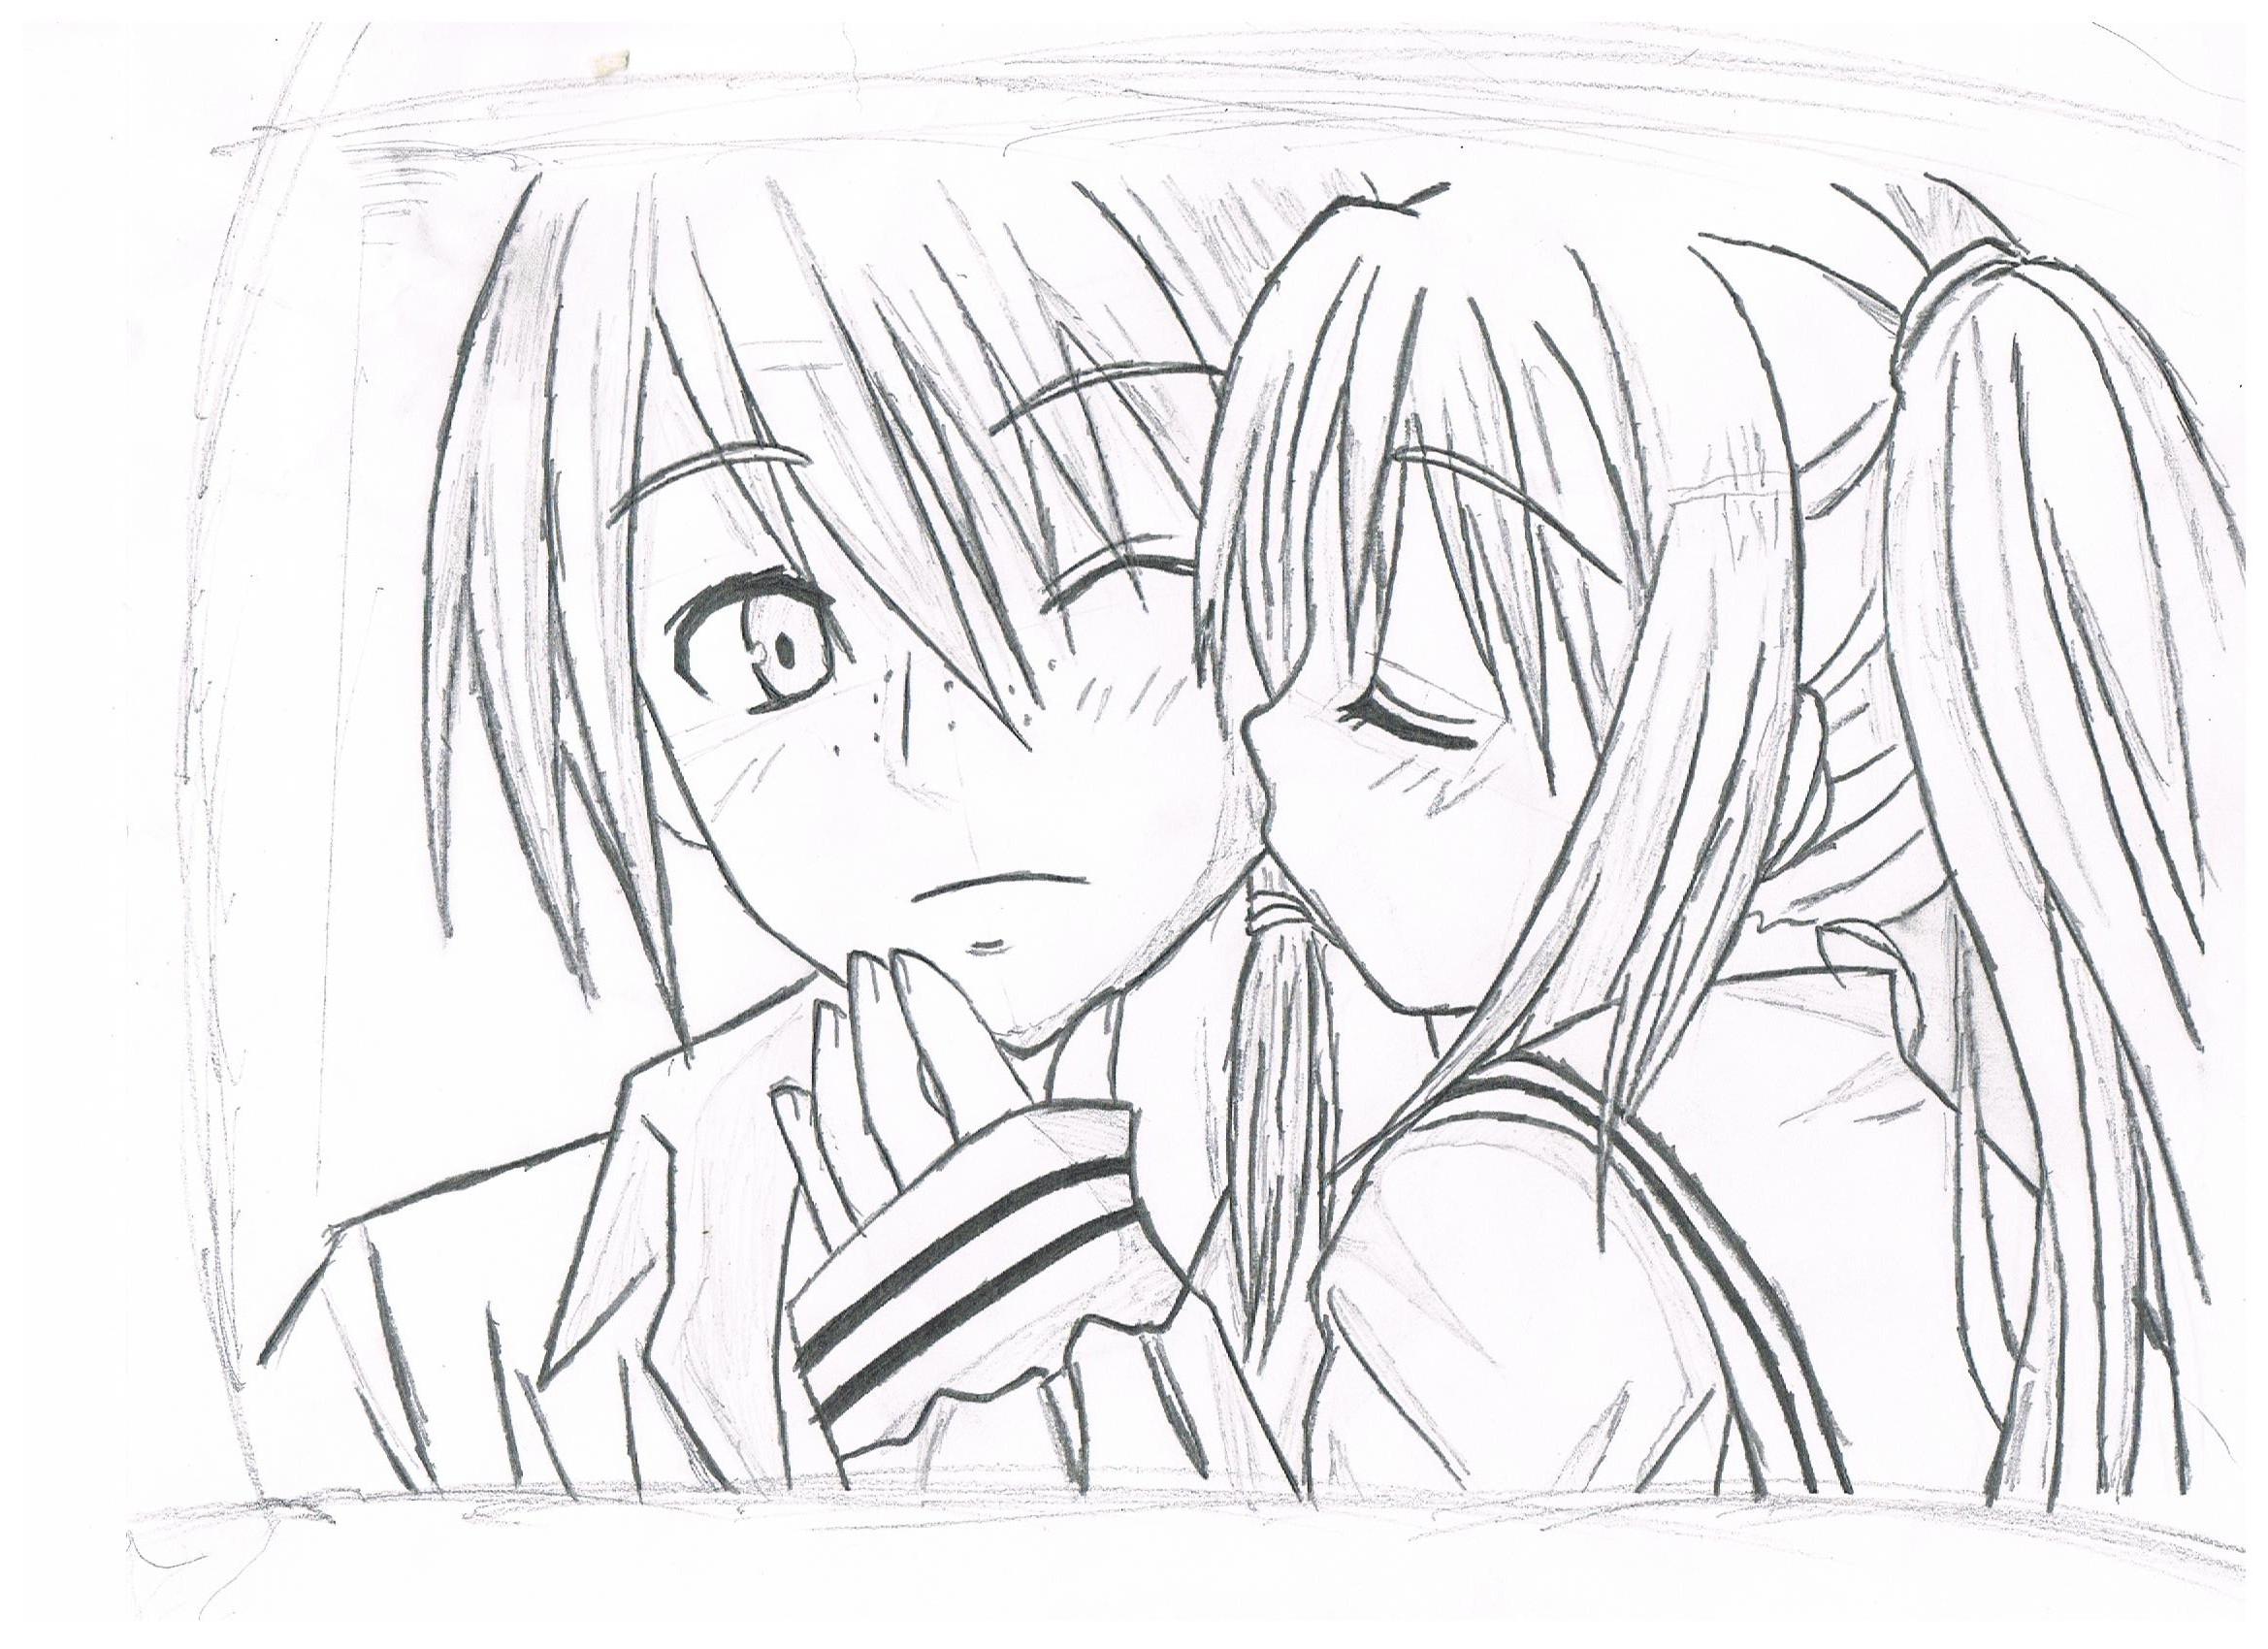 2338x1700 Anime Drawing Of A Boy And Girl Boy And Girl Anime Drawing